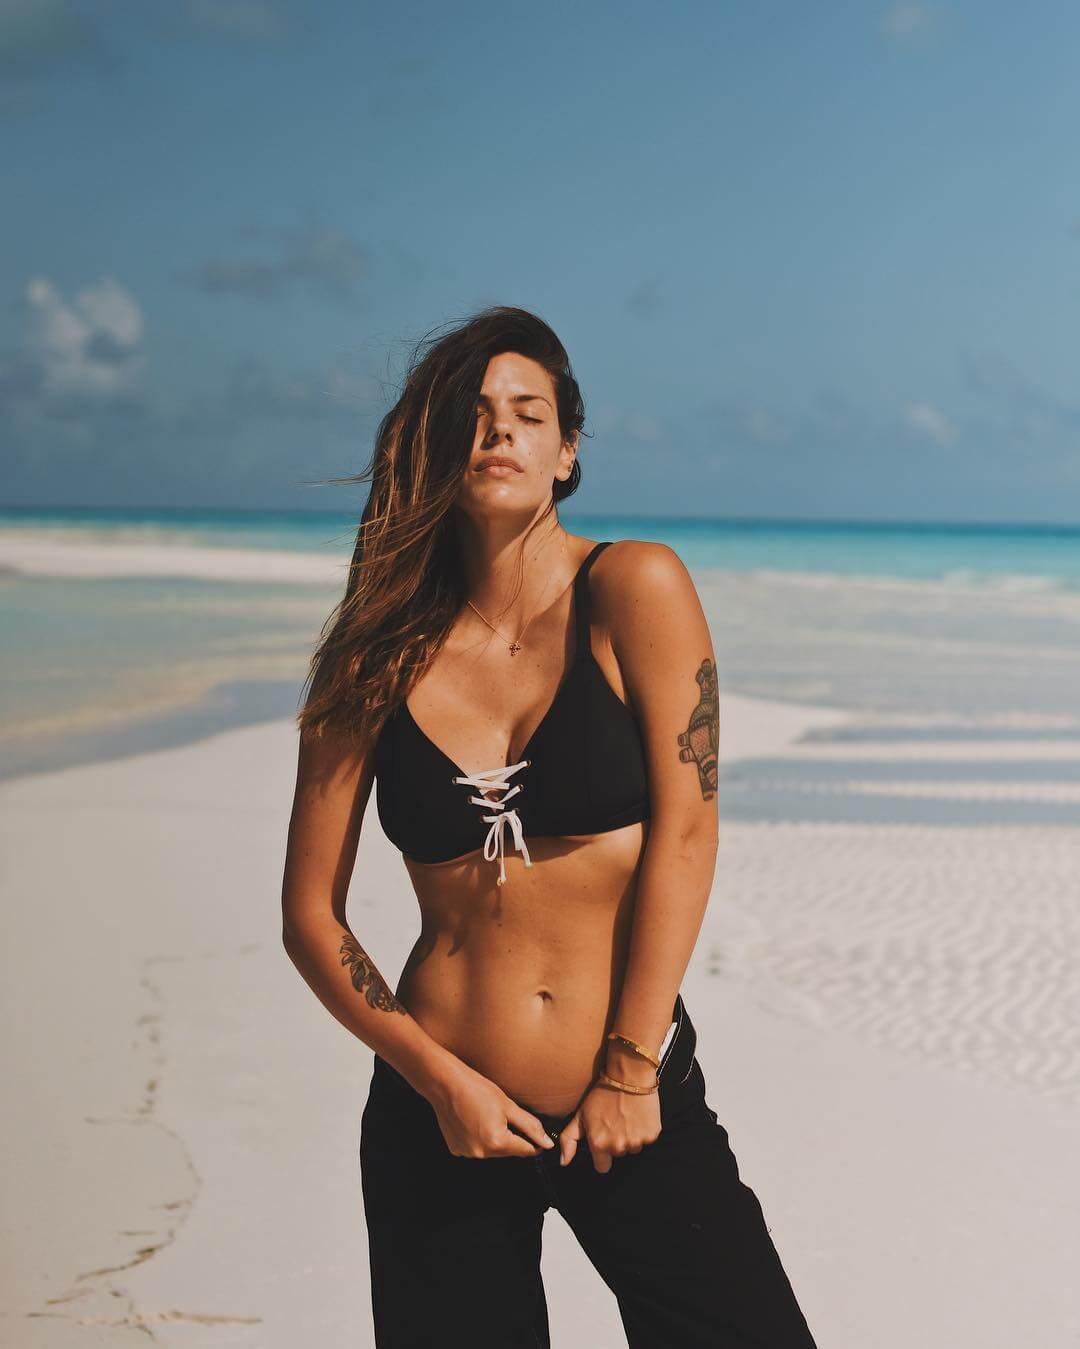 Laura Matamoros sexy bikini pic